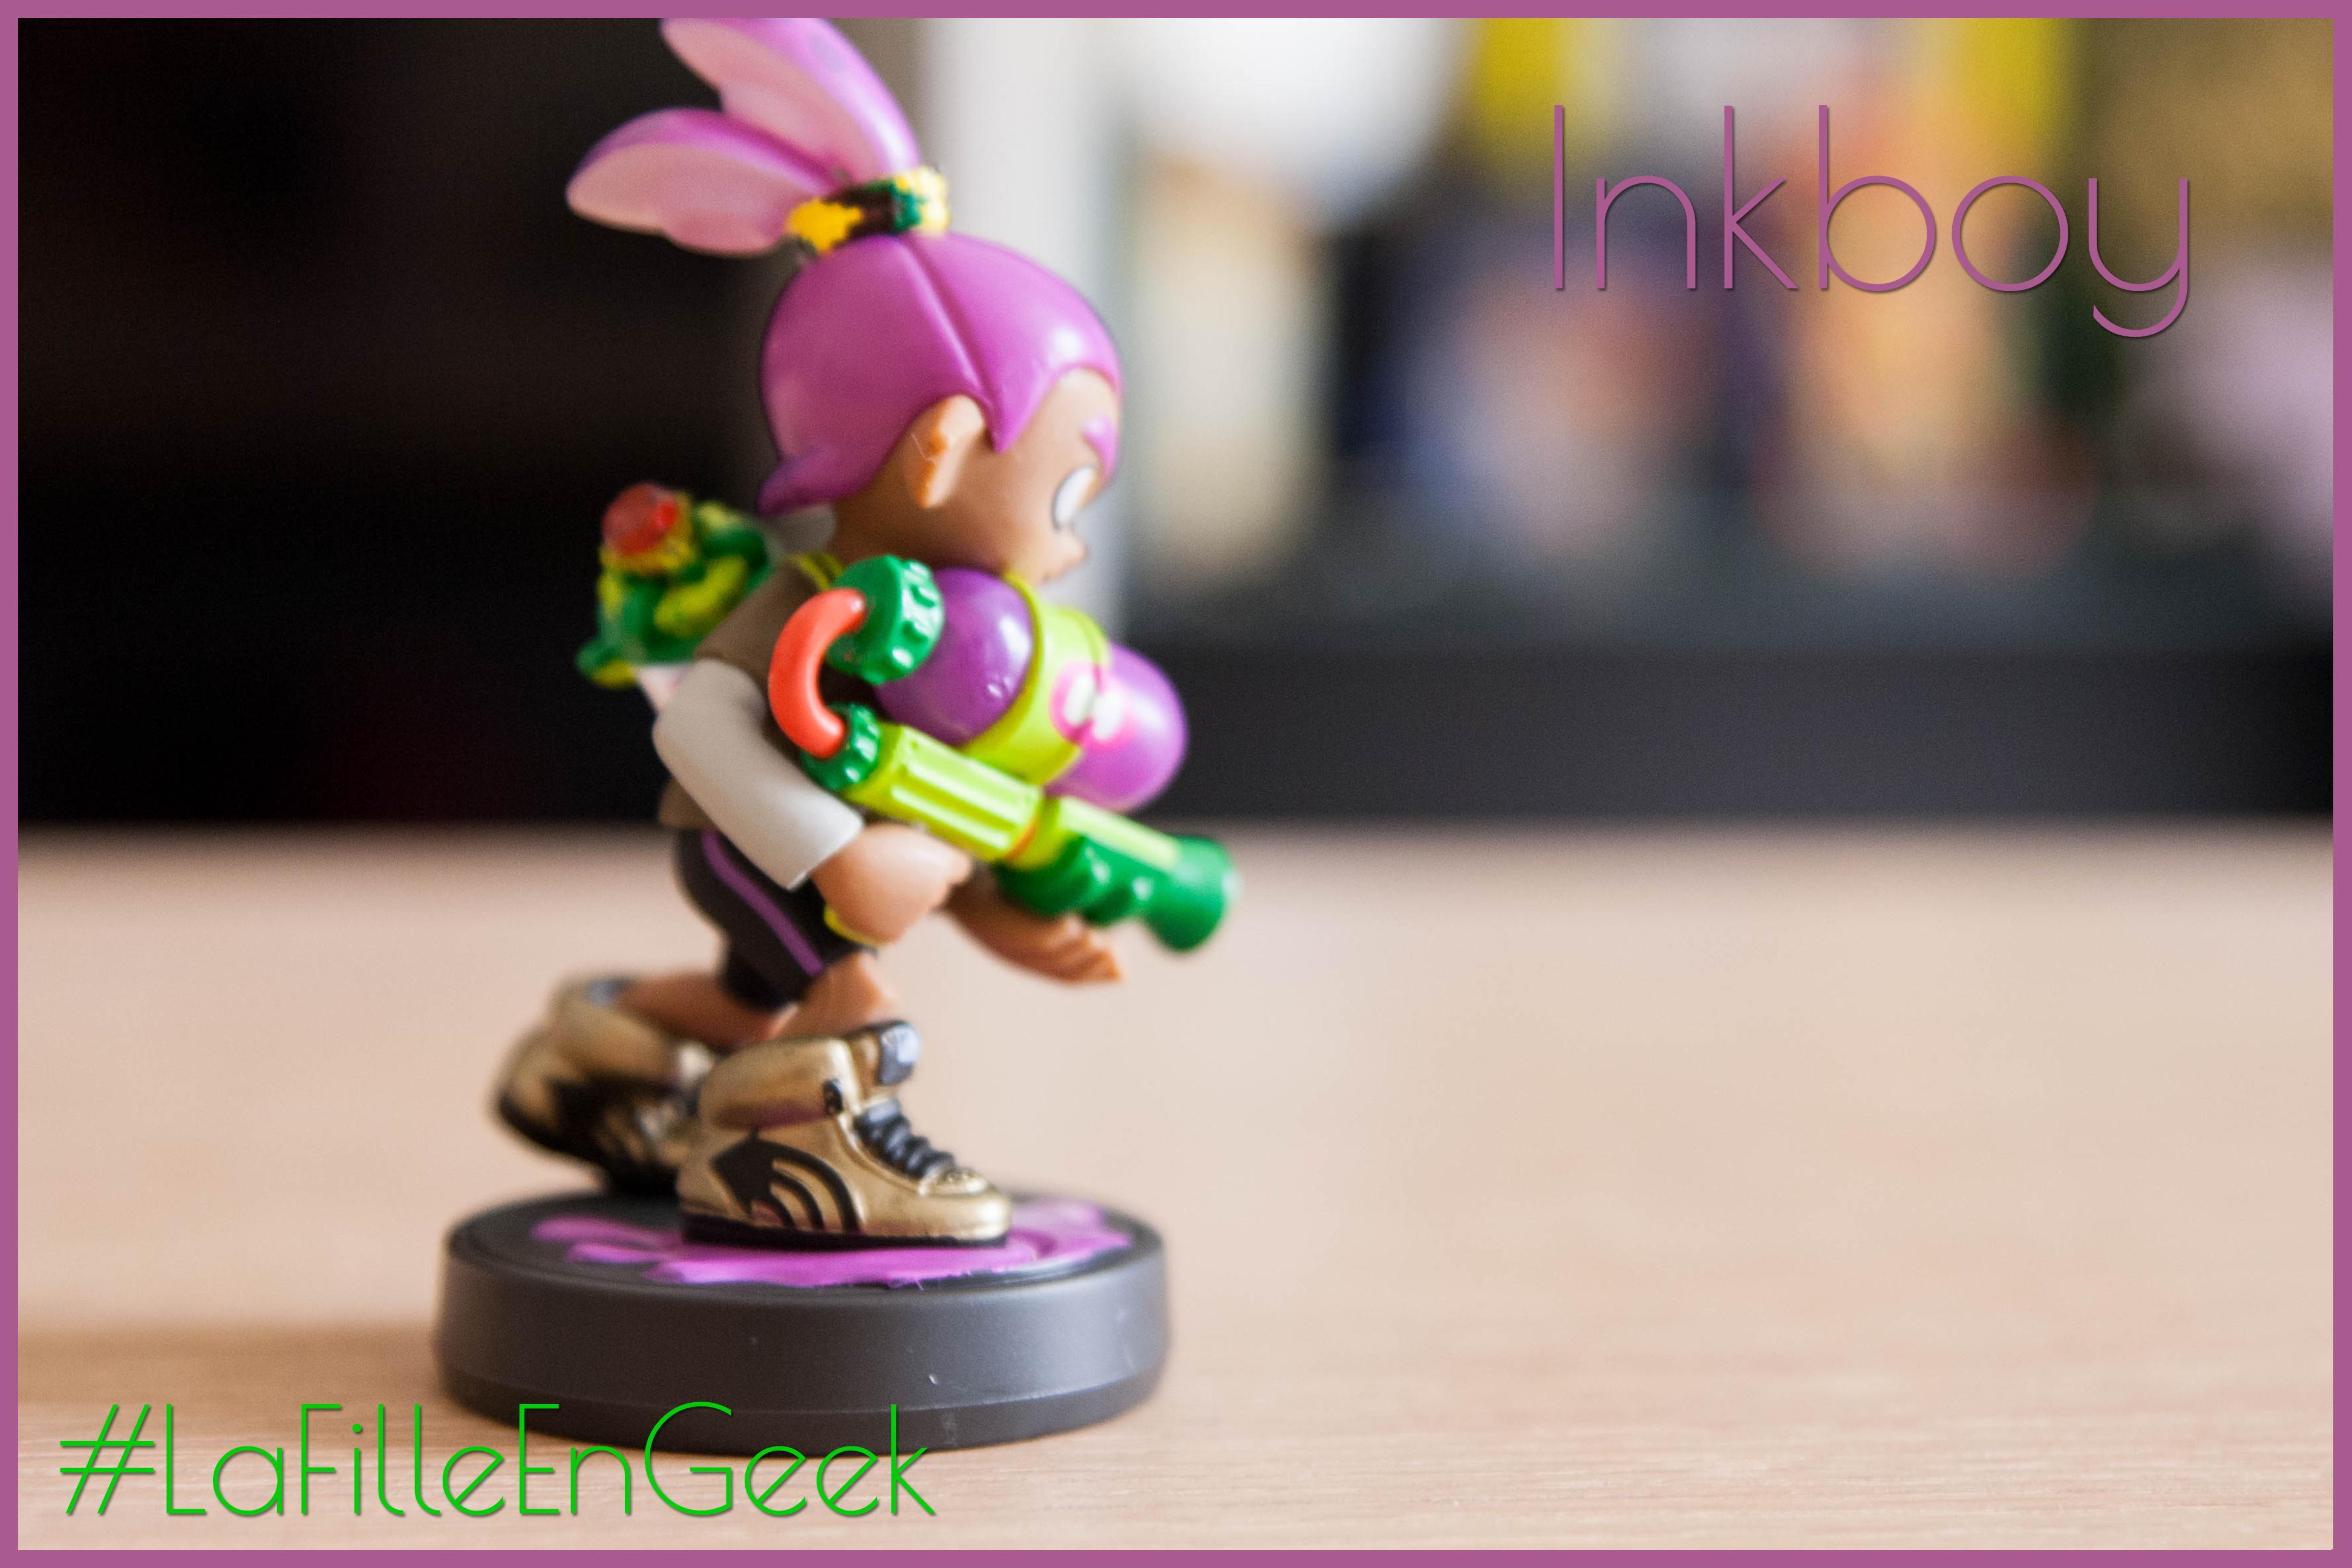 amiibo Inkboy violet Fille Geek